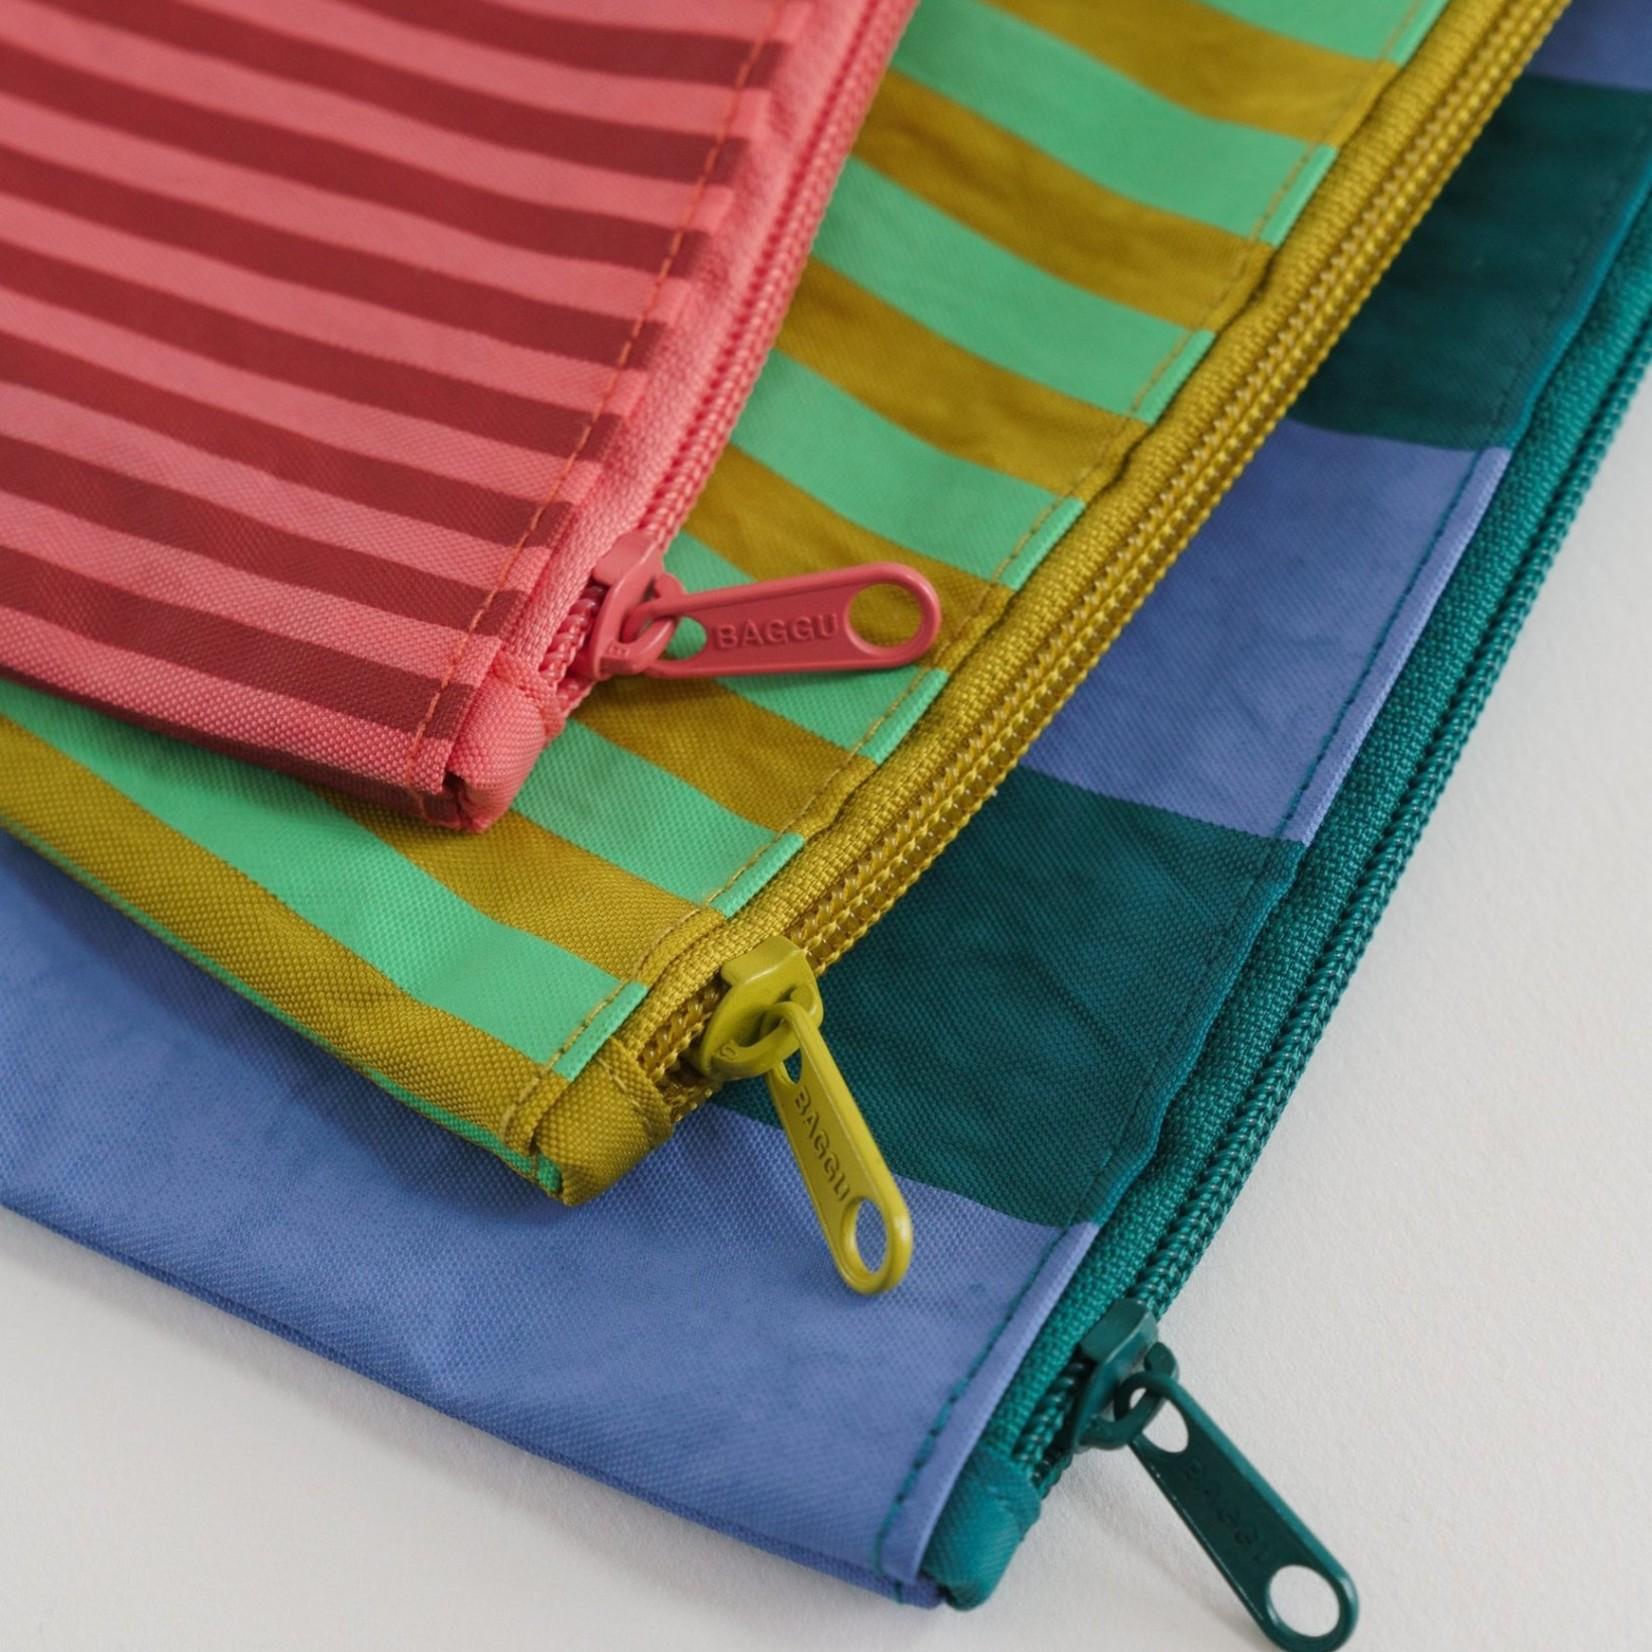 Baggu Baggu Flat Pouch Set Afternoon Stripes